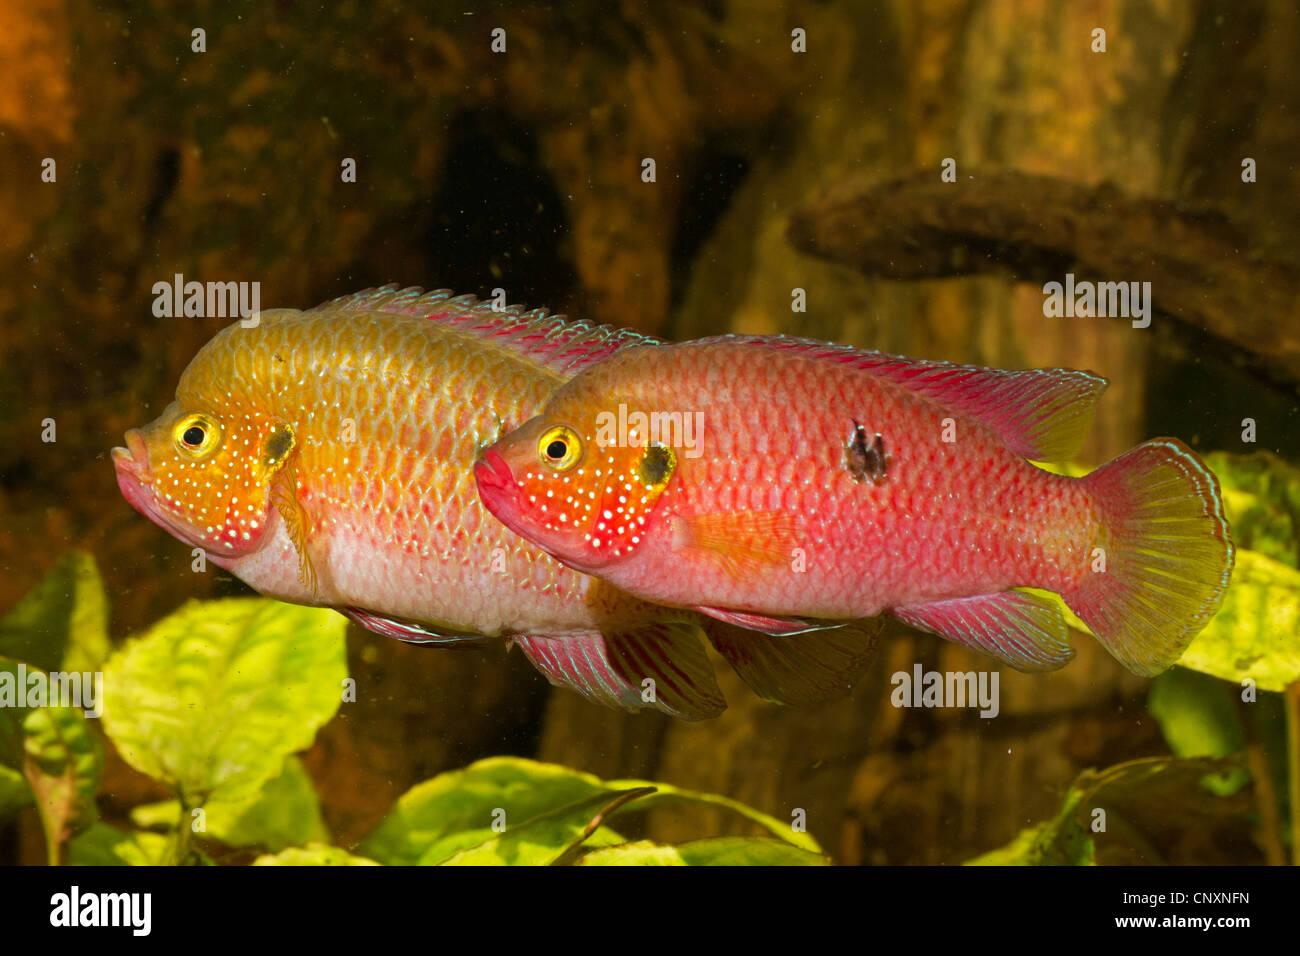 jewel fish, jewelfish, red jewel fish, red cichlid (Hemichromis bimaculatus, Hemichromis guttatus), male with female - Stock Image